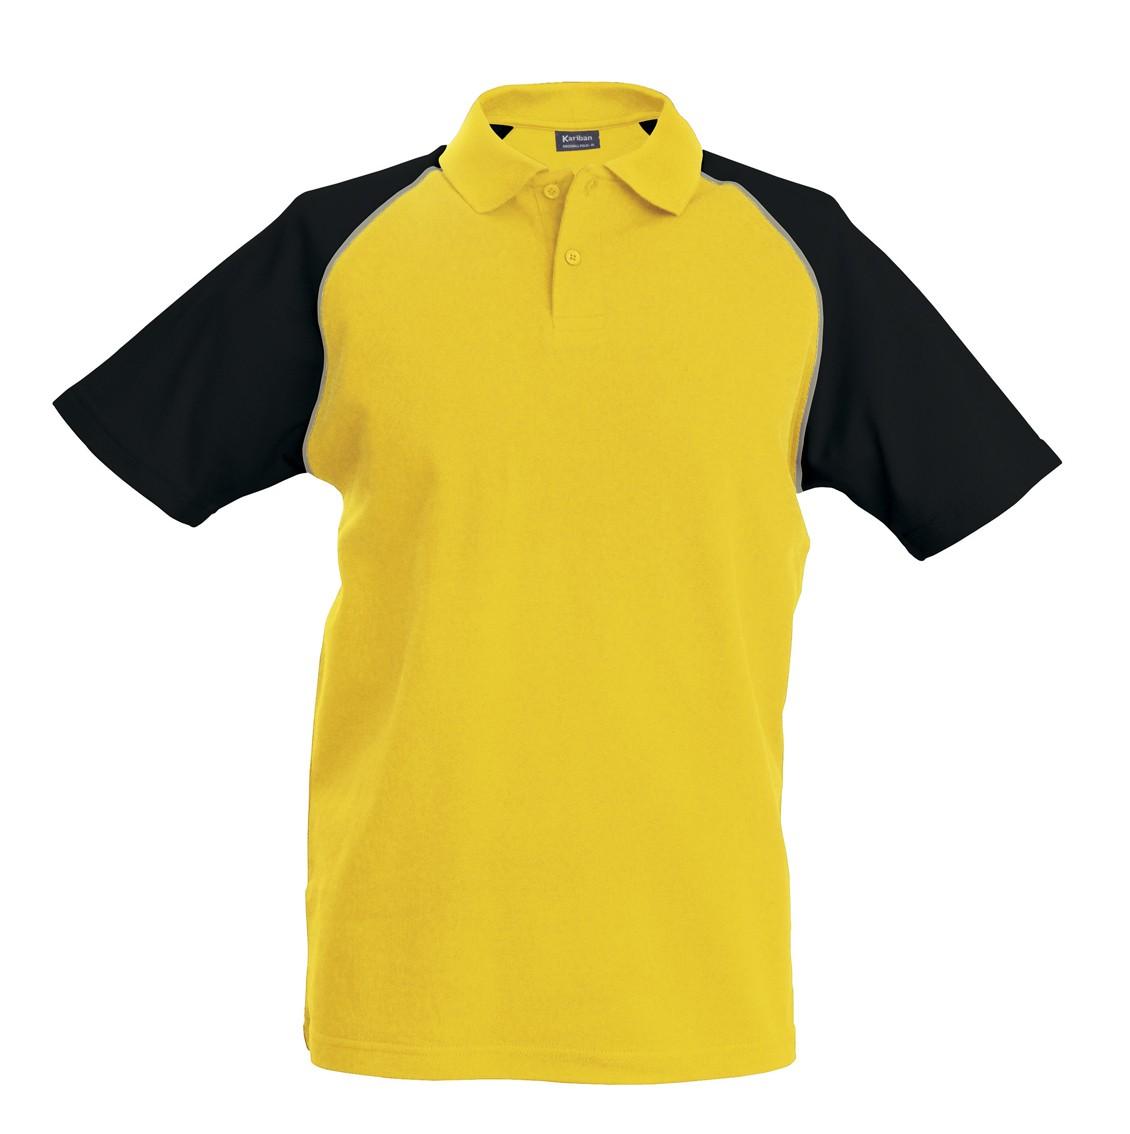 K226 Yellow - Black